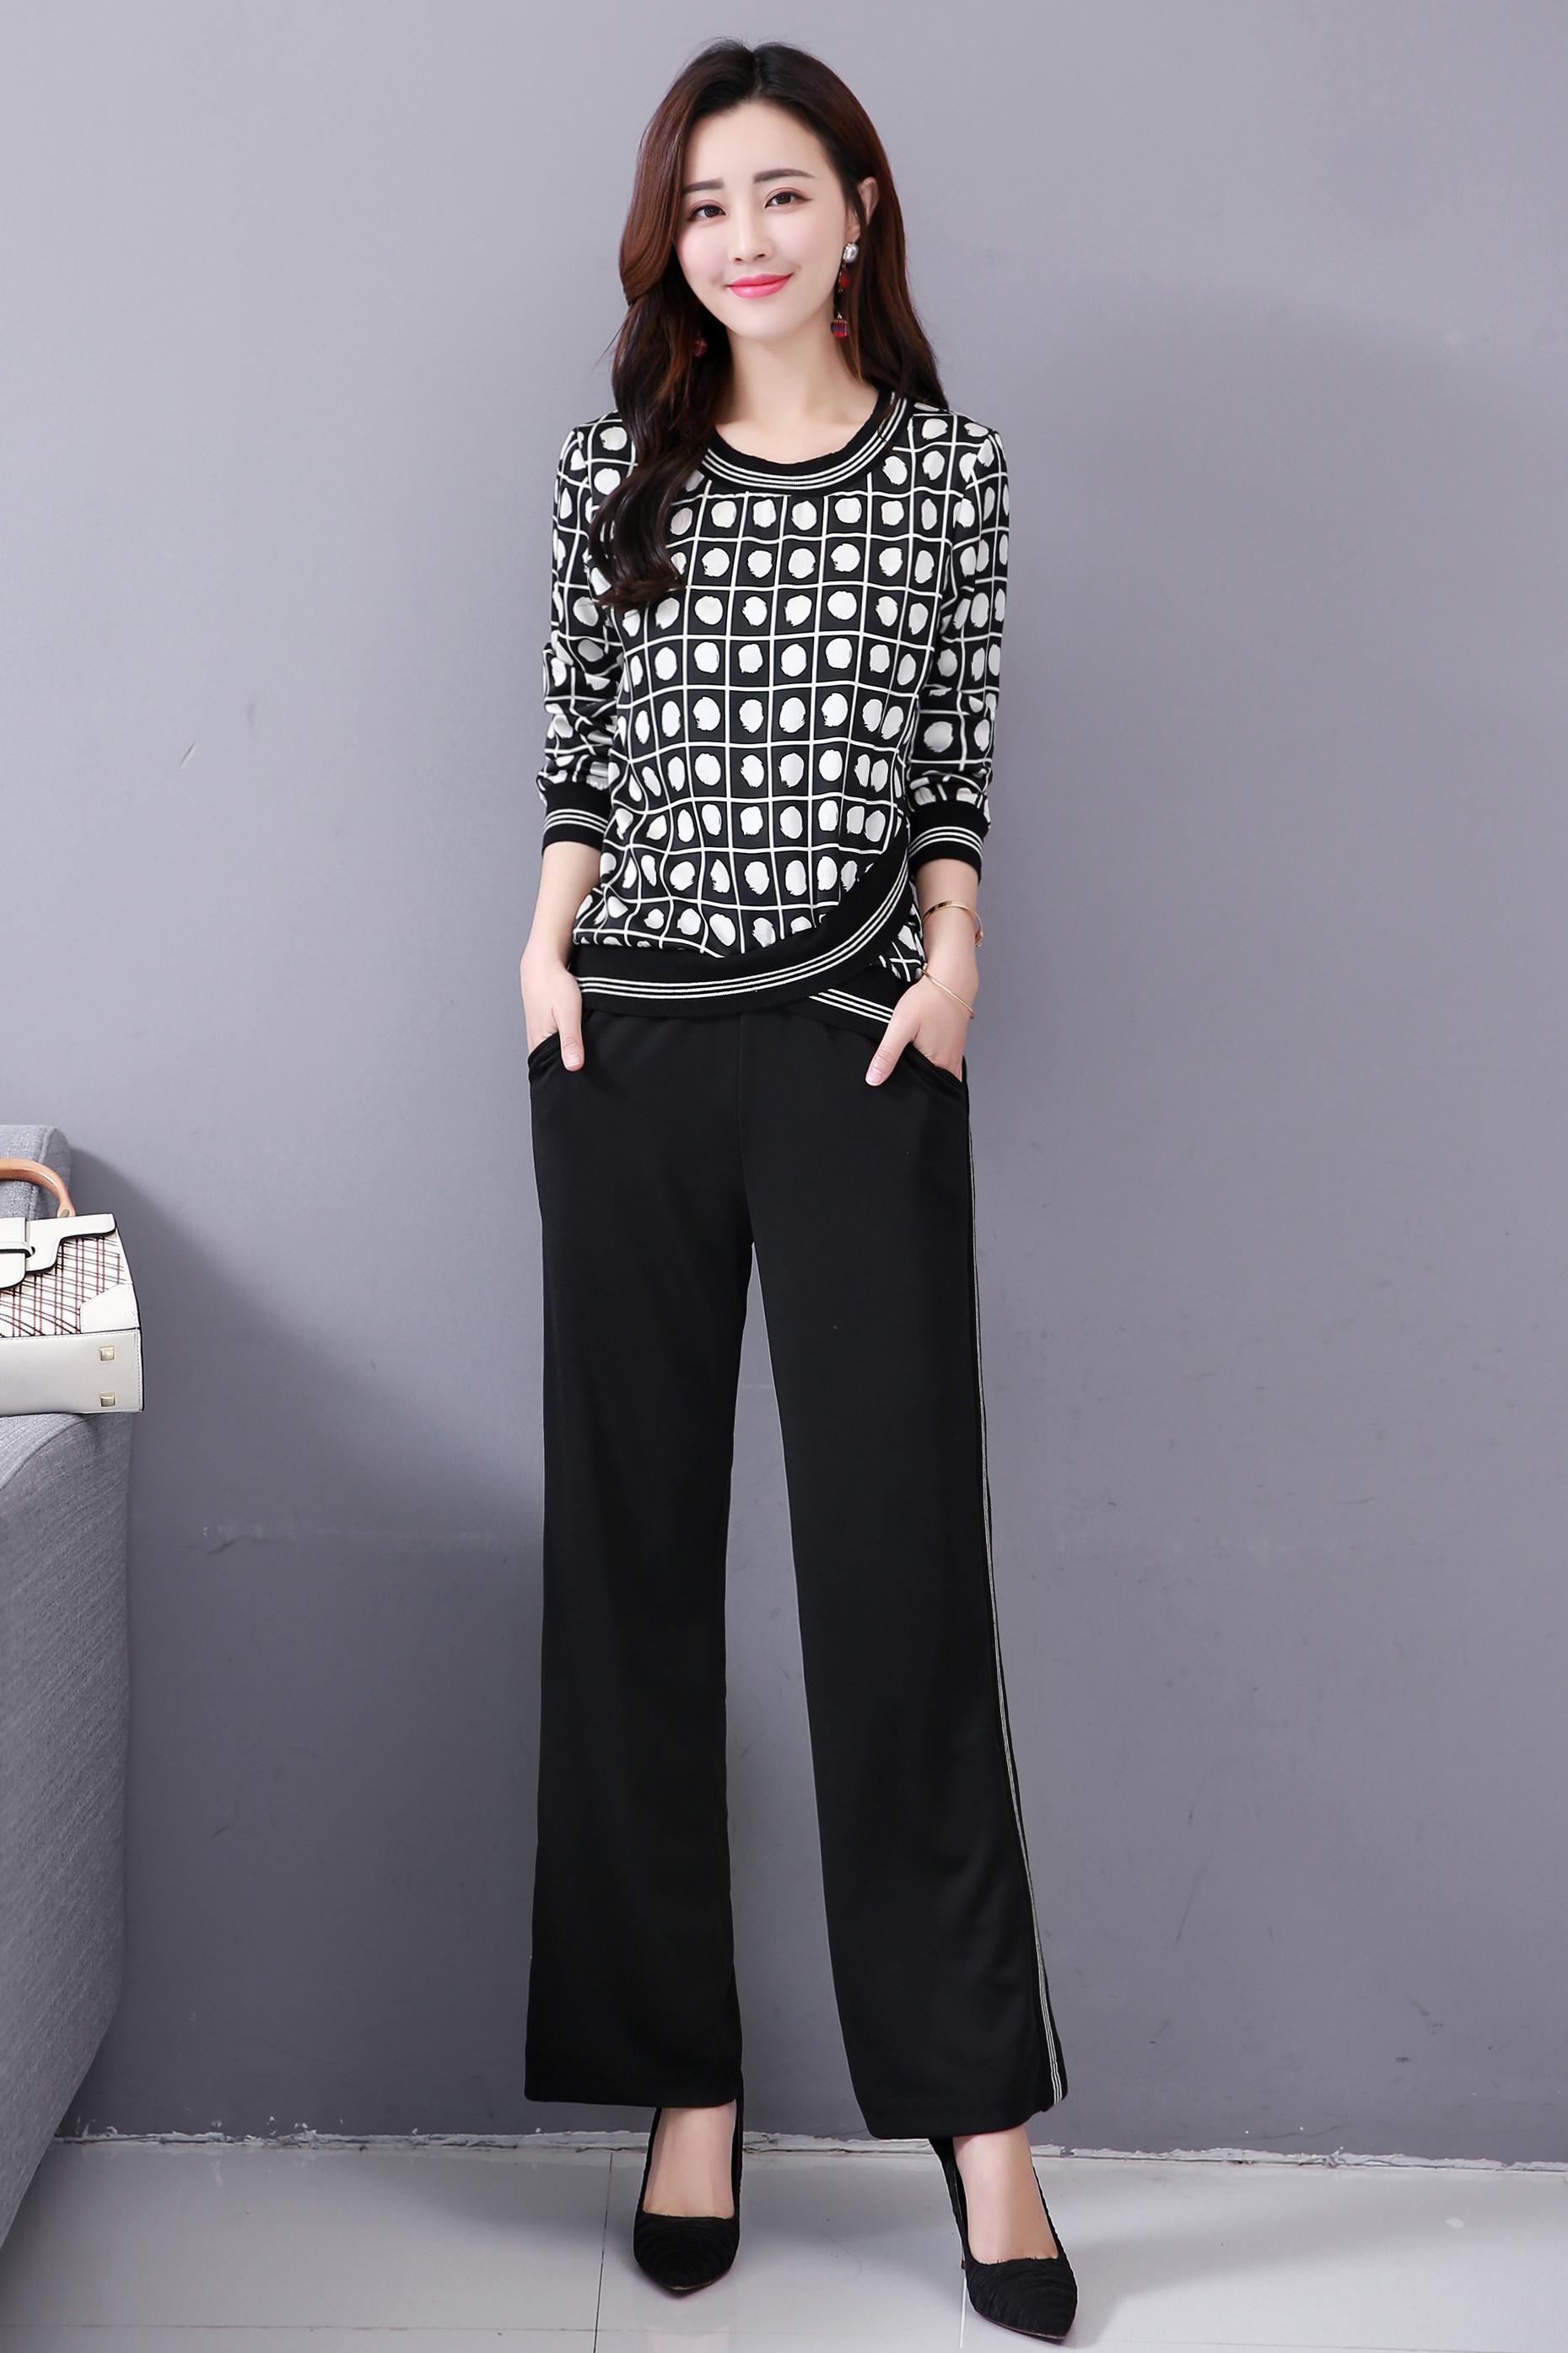 M-5x Autumn Black Printed Two Piece Sets Women Plus Size Long Sleeve Tops And Pants Suits Korean Elegant Office 2 Piece Sets 32